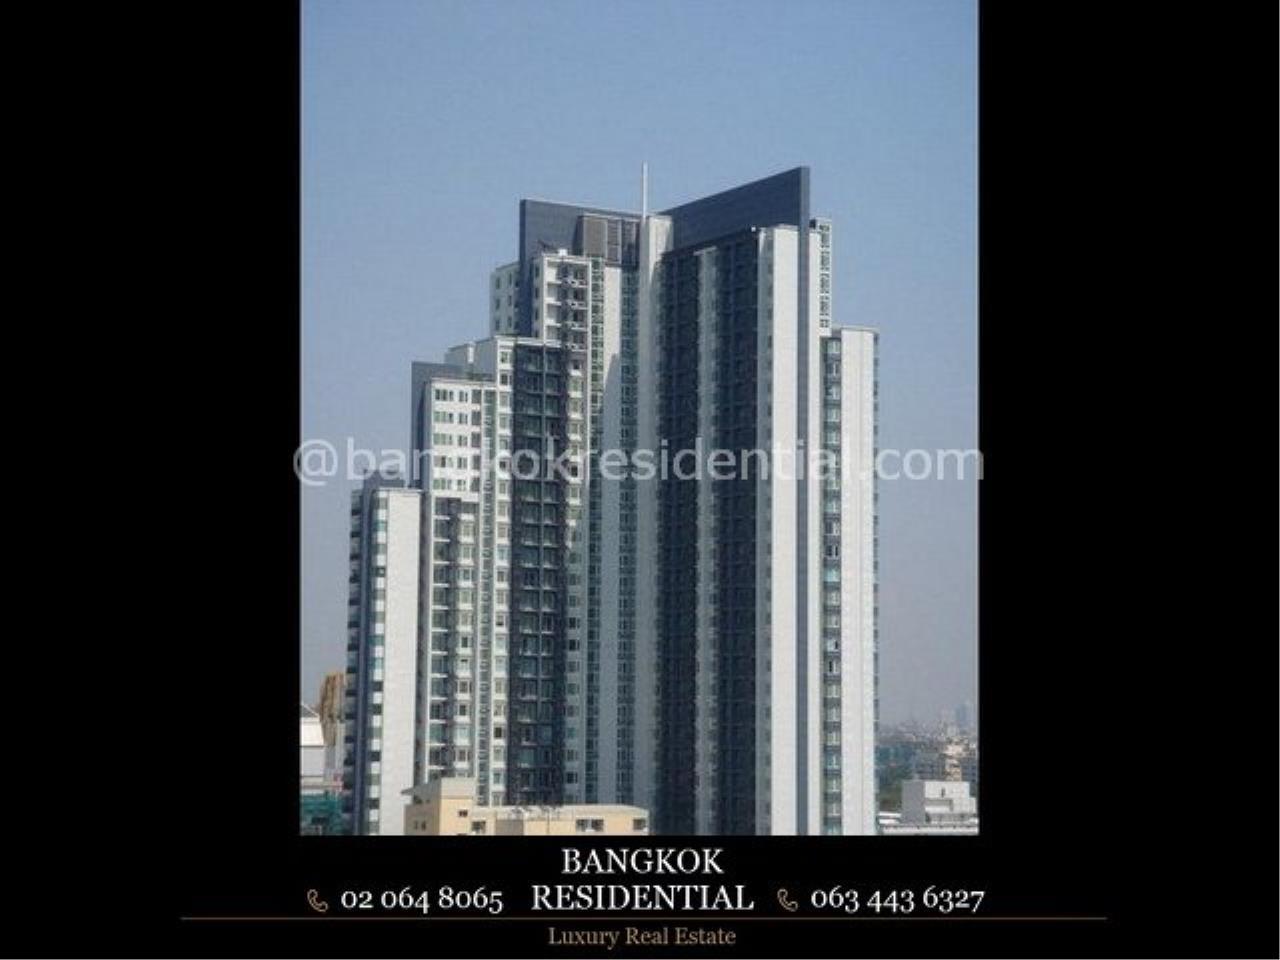 Bangkok Residential Agency's 1BR Siri at Sukhumvit For Rent (BR4782CD) 3